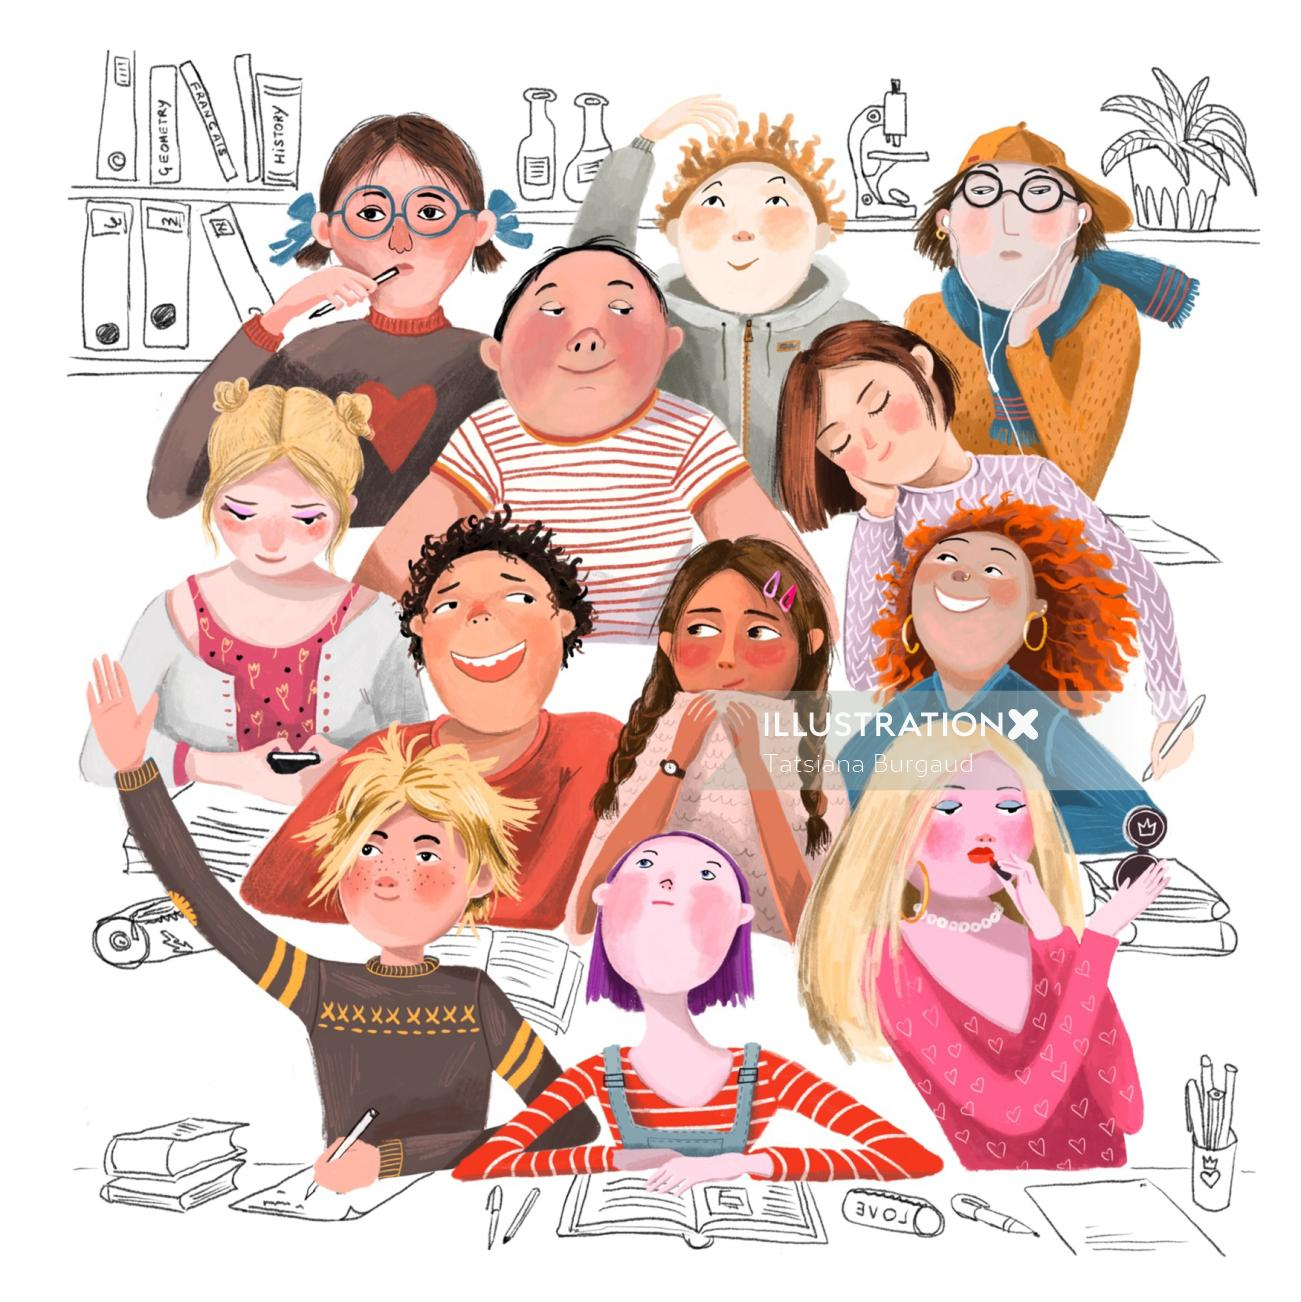 children , school, lesson, diversity, illustration